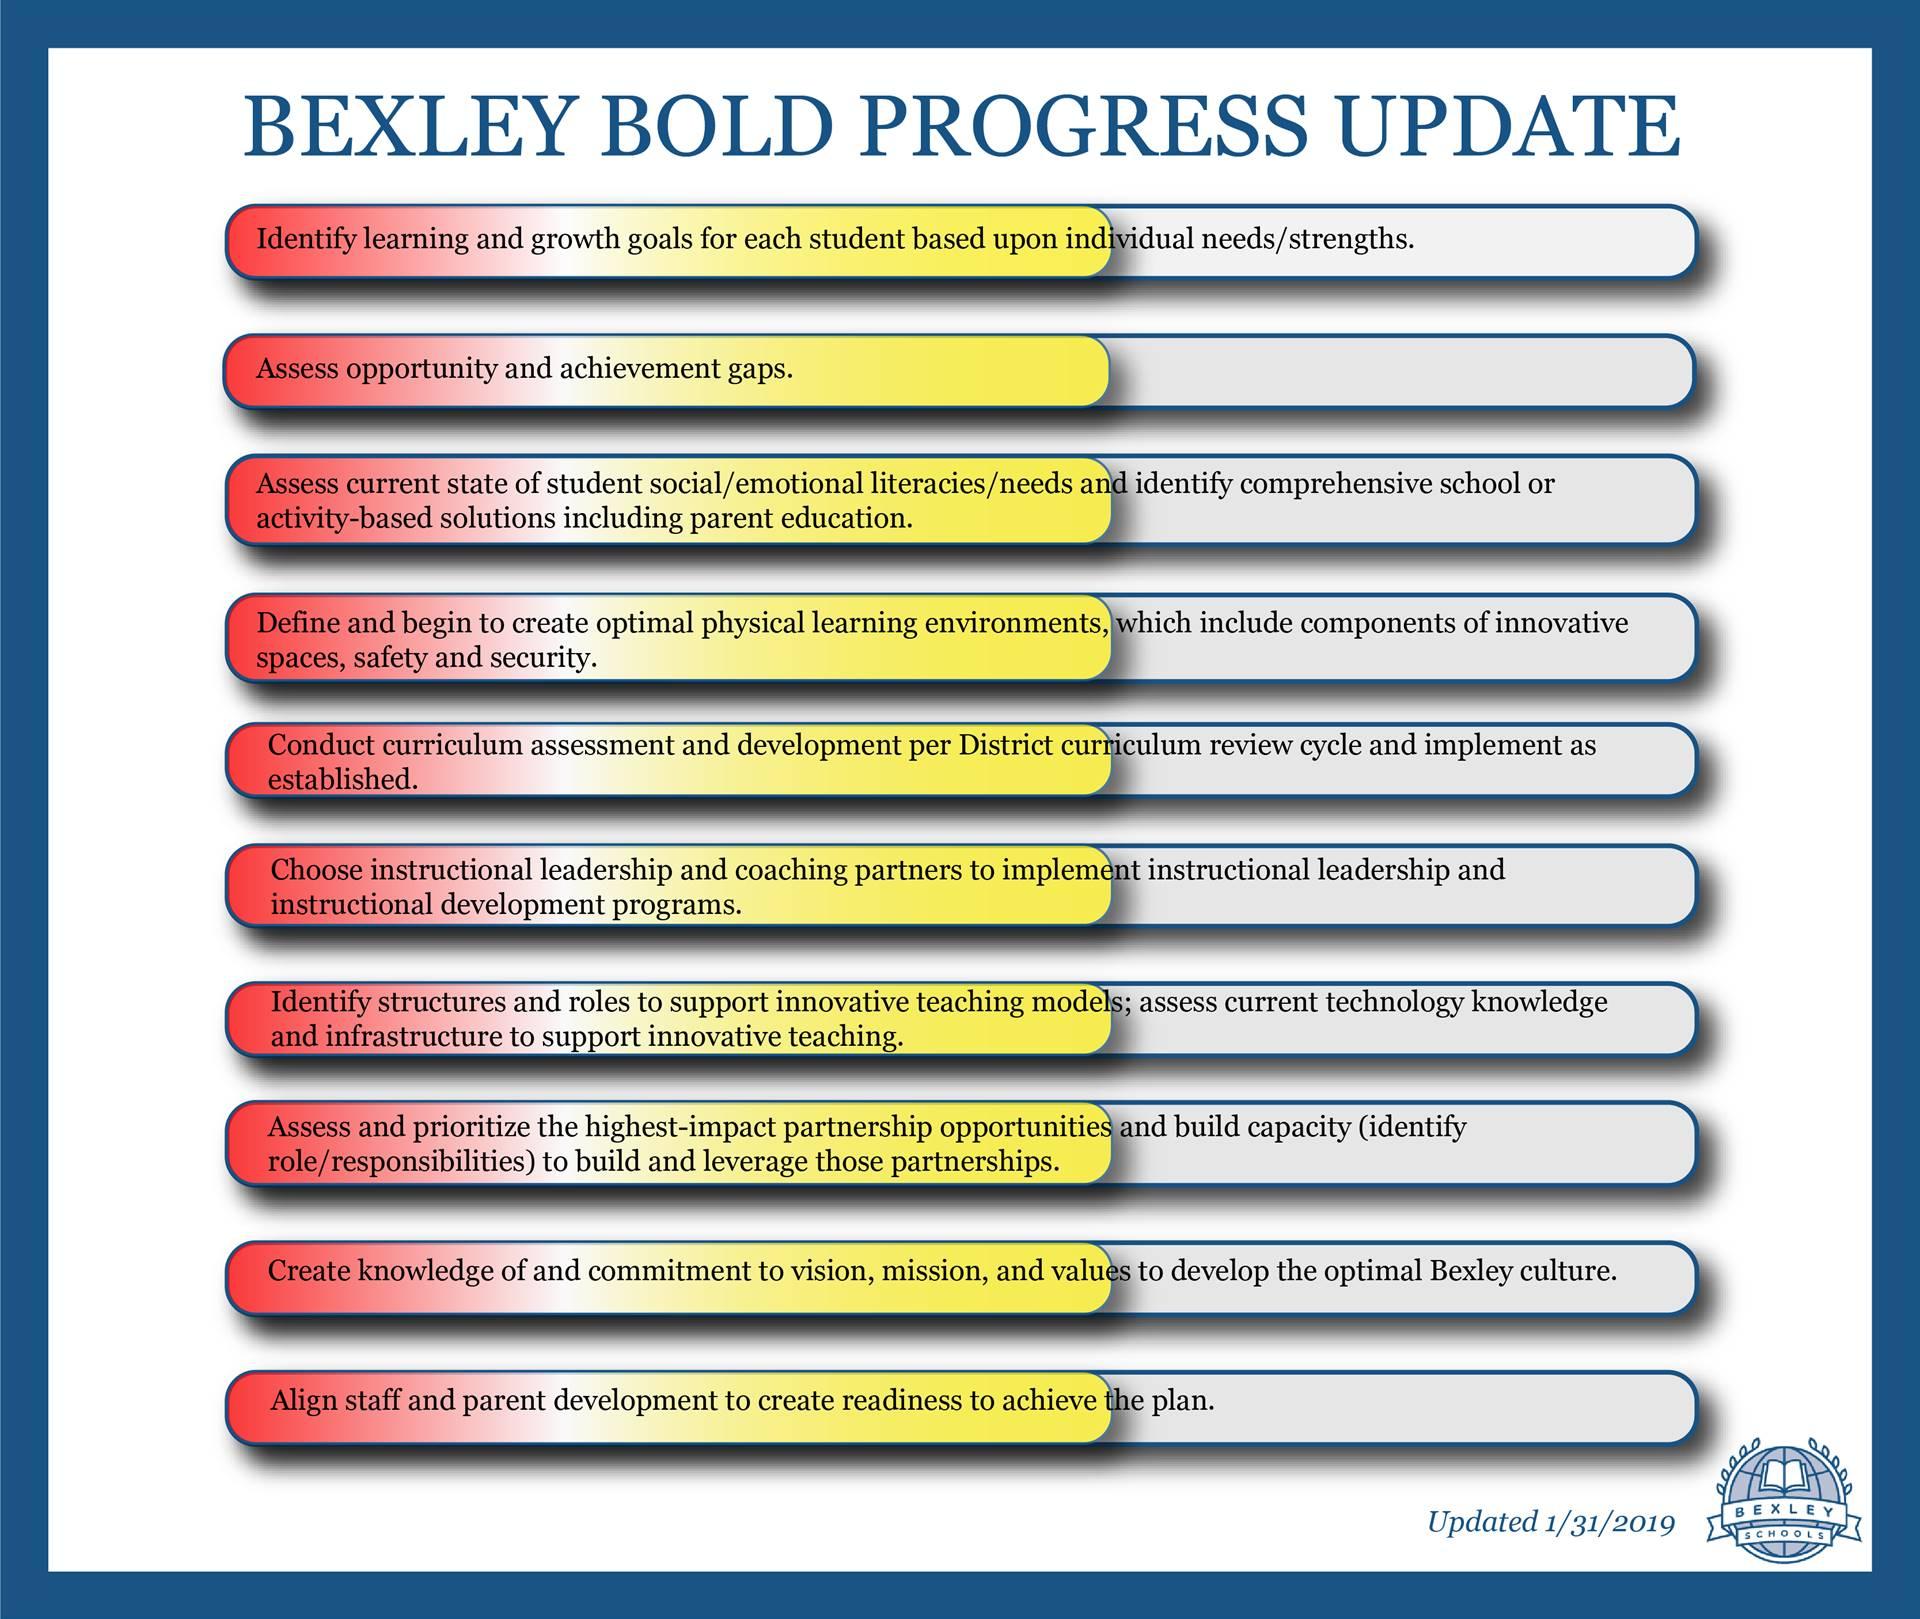 Bexley's Strategic Plan Progress Update January 2019